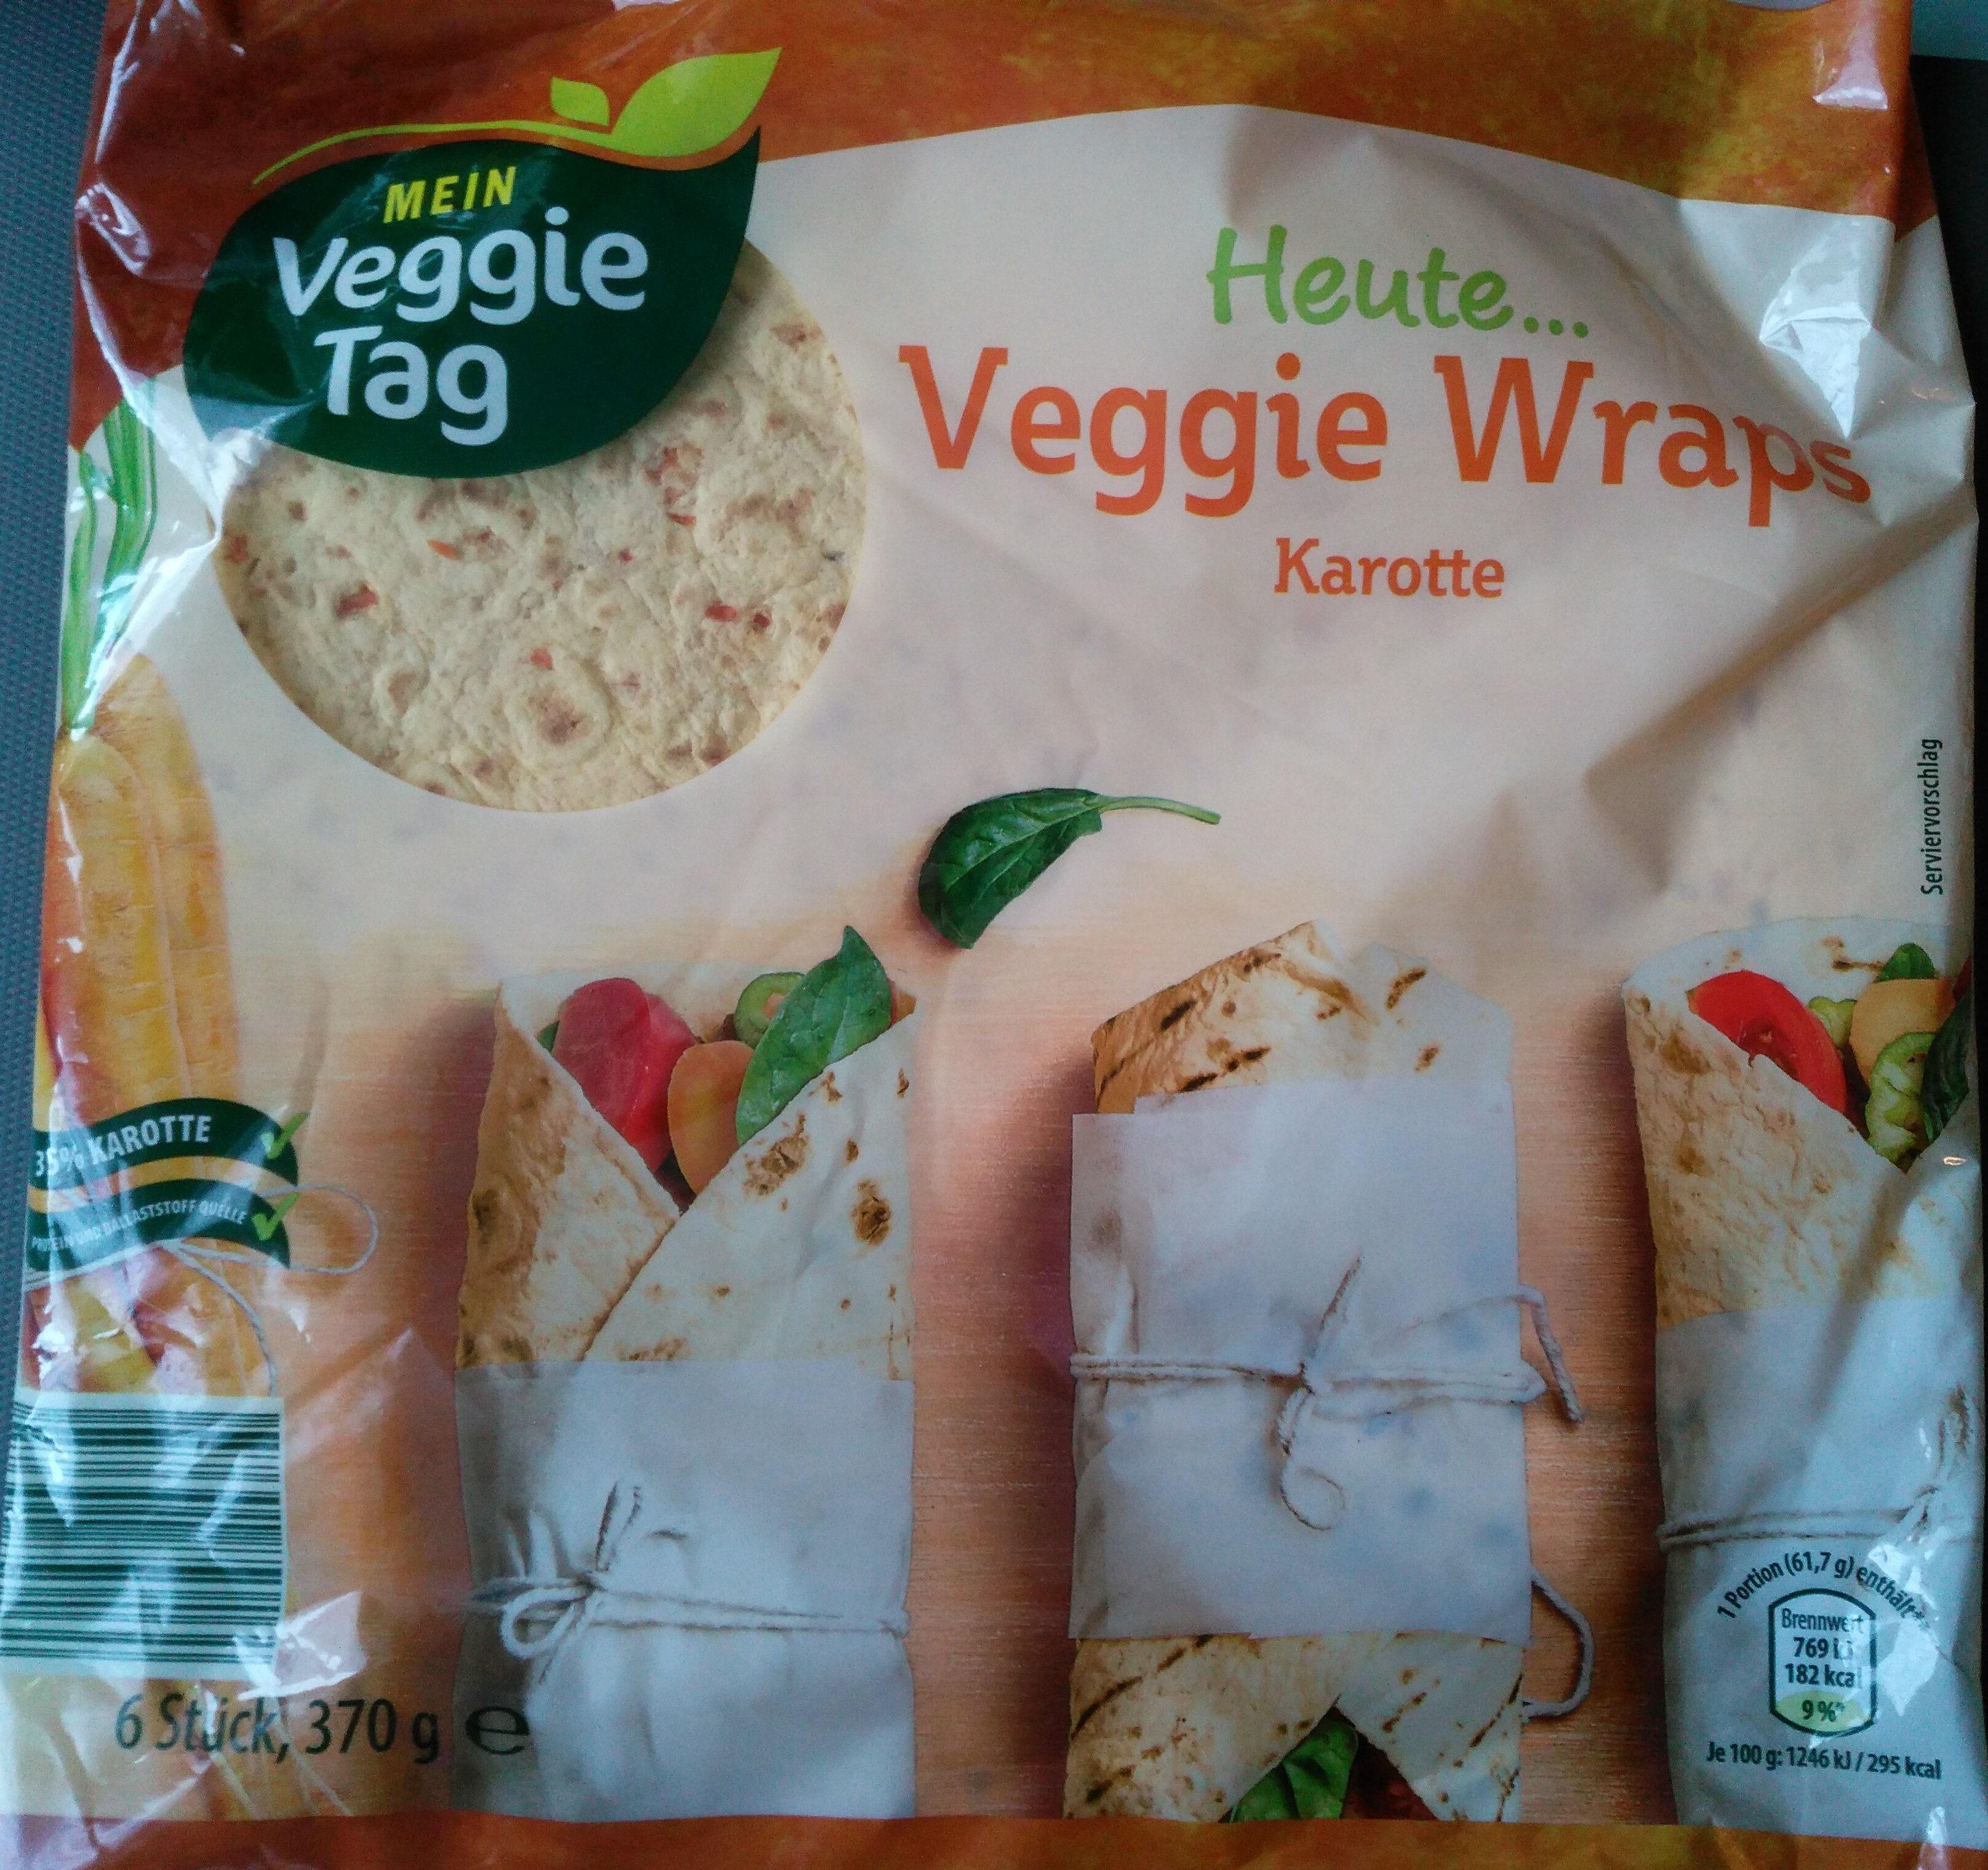 Veggie Wraps - Karotte - Produkt - de